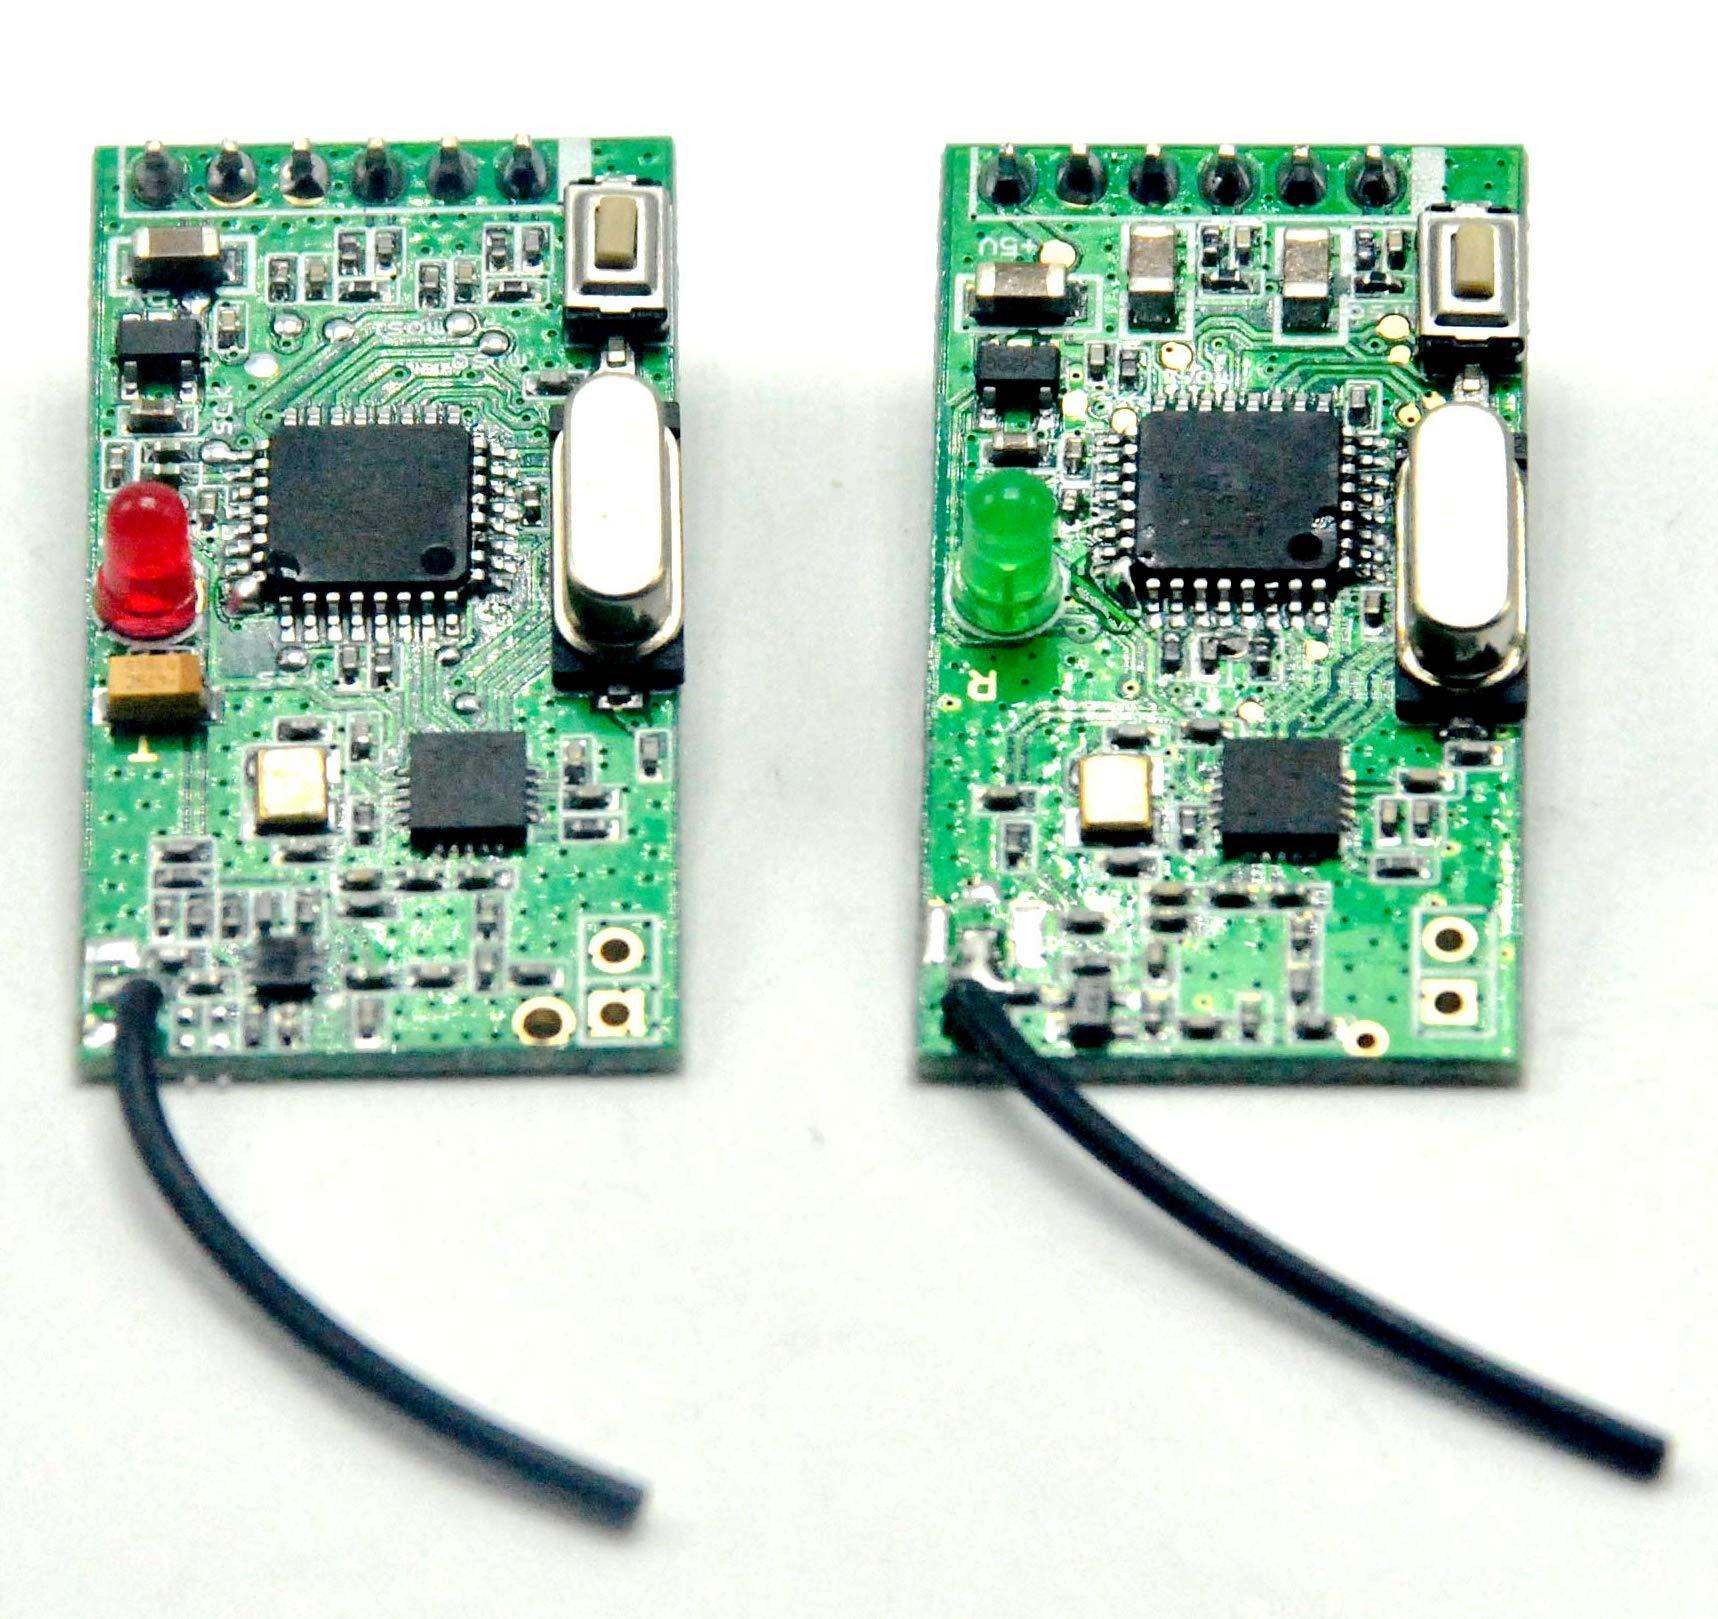 2.4G NRF24L01 Wireless Digital Audio Transceiver Module Wifi Speaker Module (1 Piece Transmitter & 1 Piece Receiver)